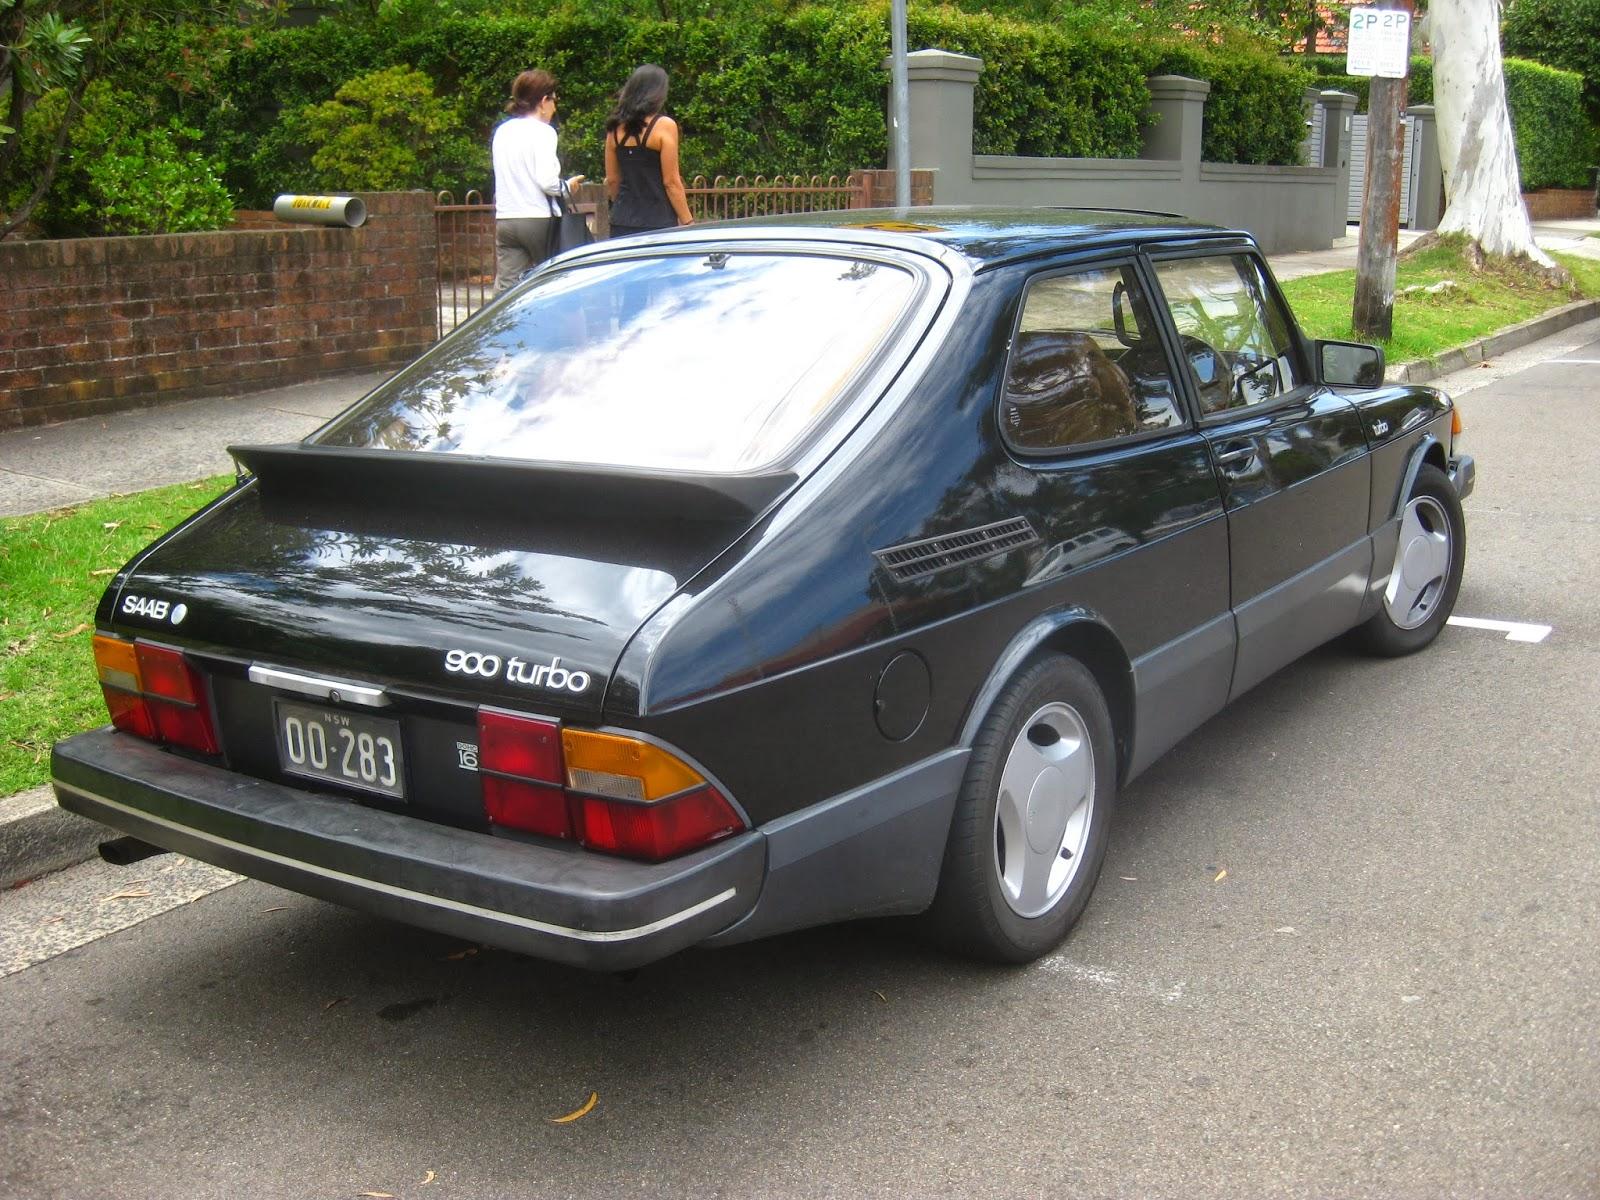 Aussie Old Parked Cars  1985 Saab 900 Turbo 16v 3